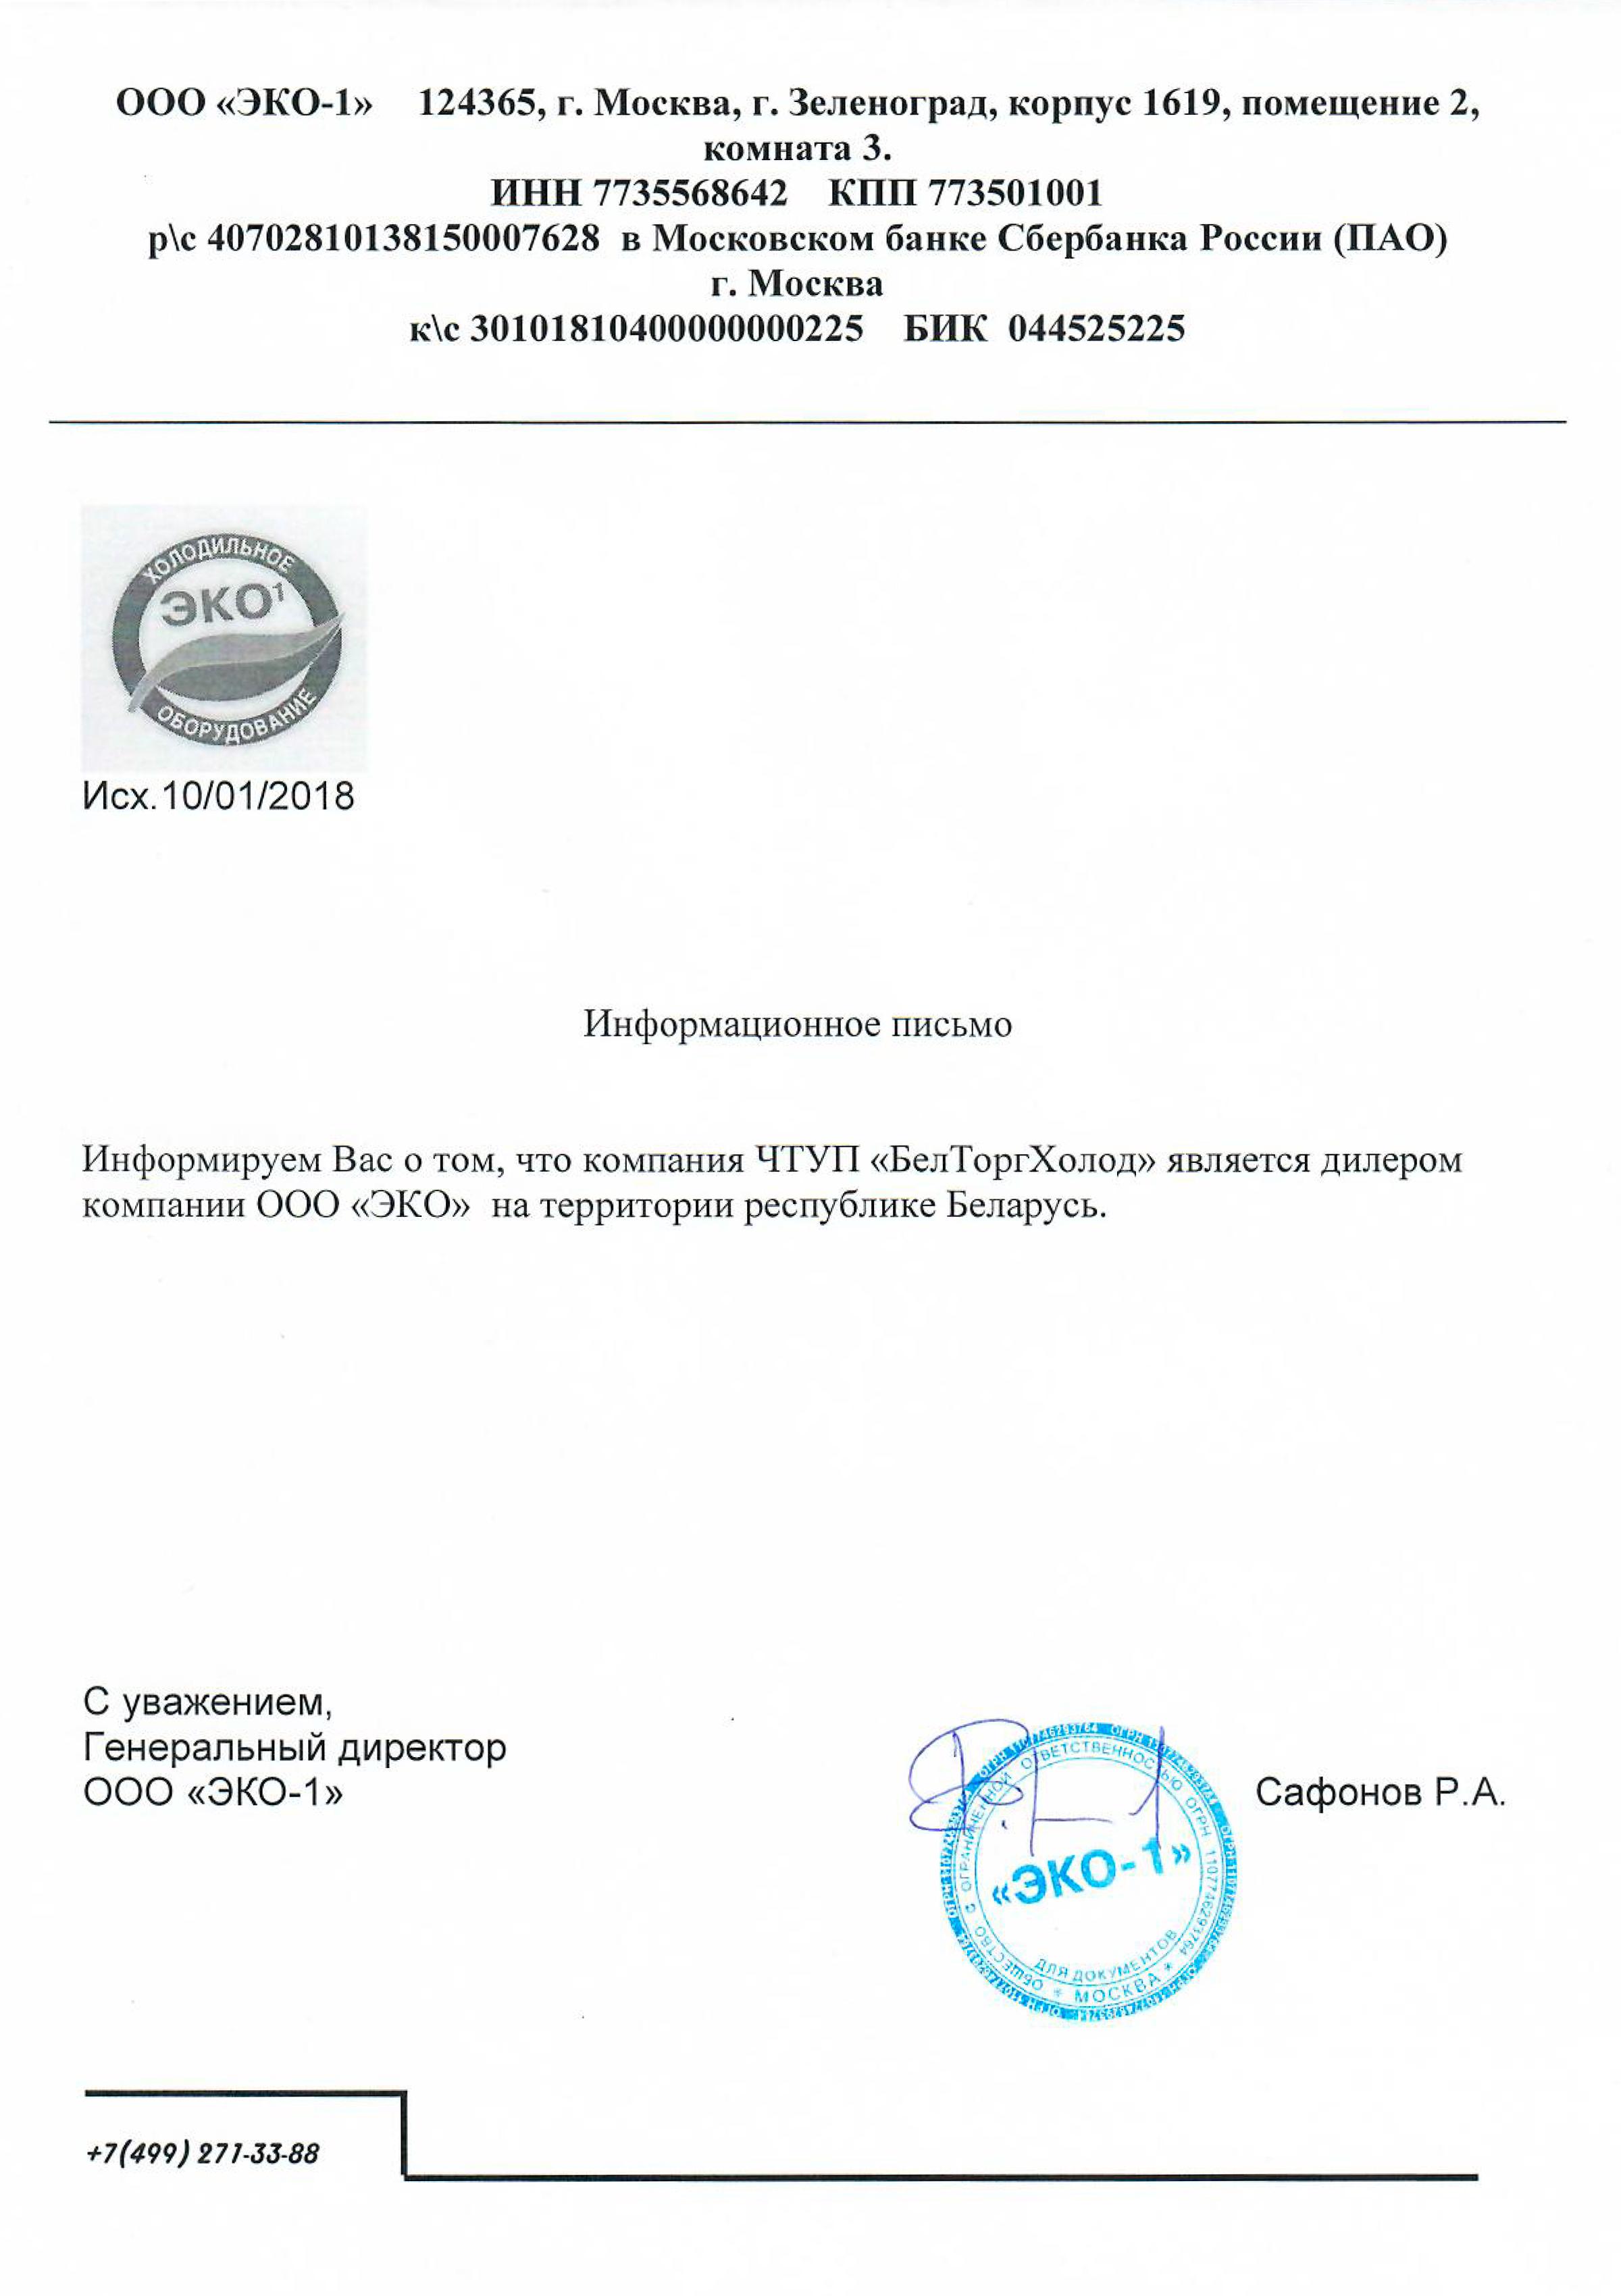 Сертификат ЭКО-1